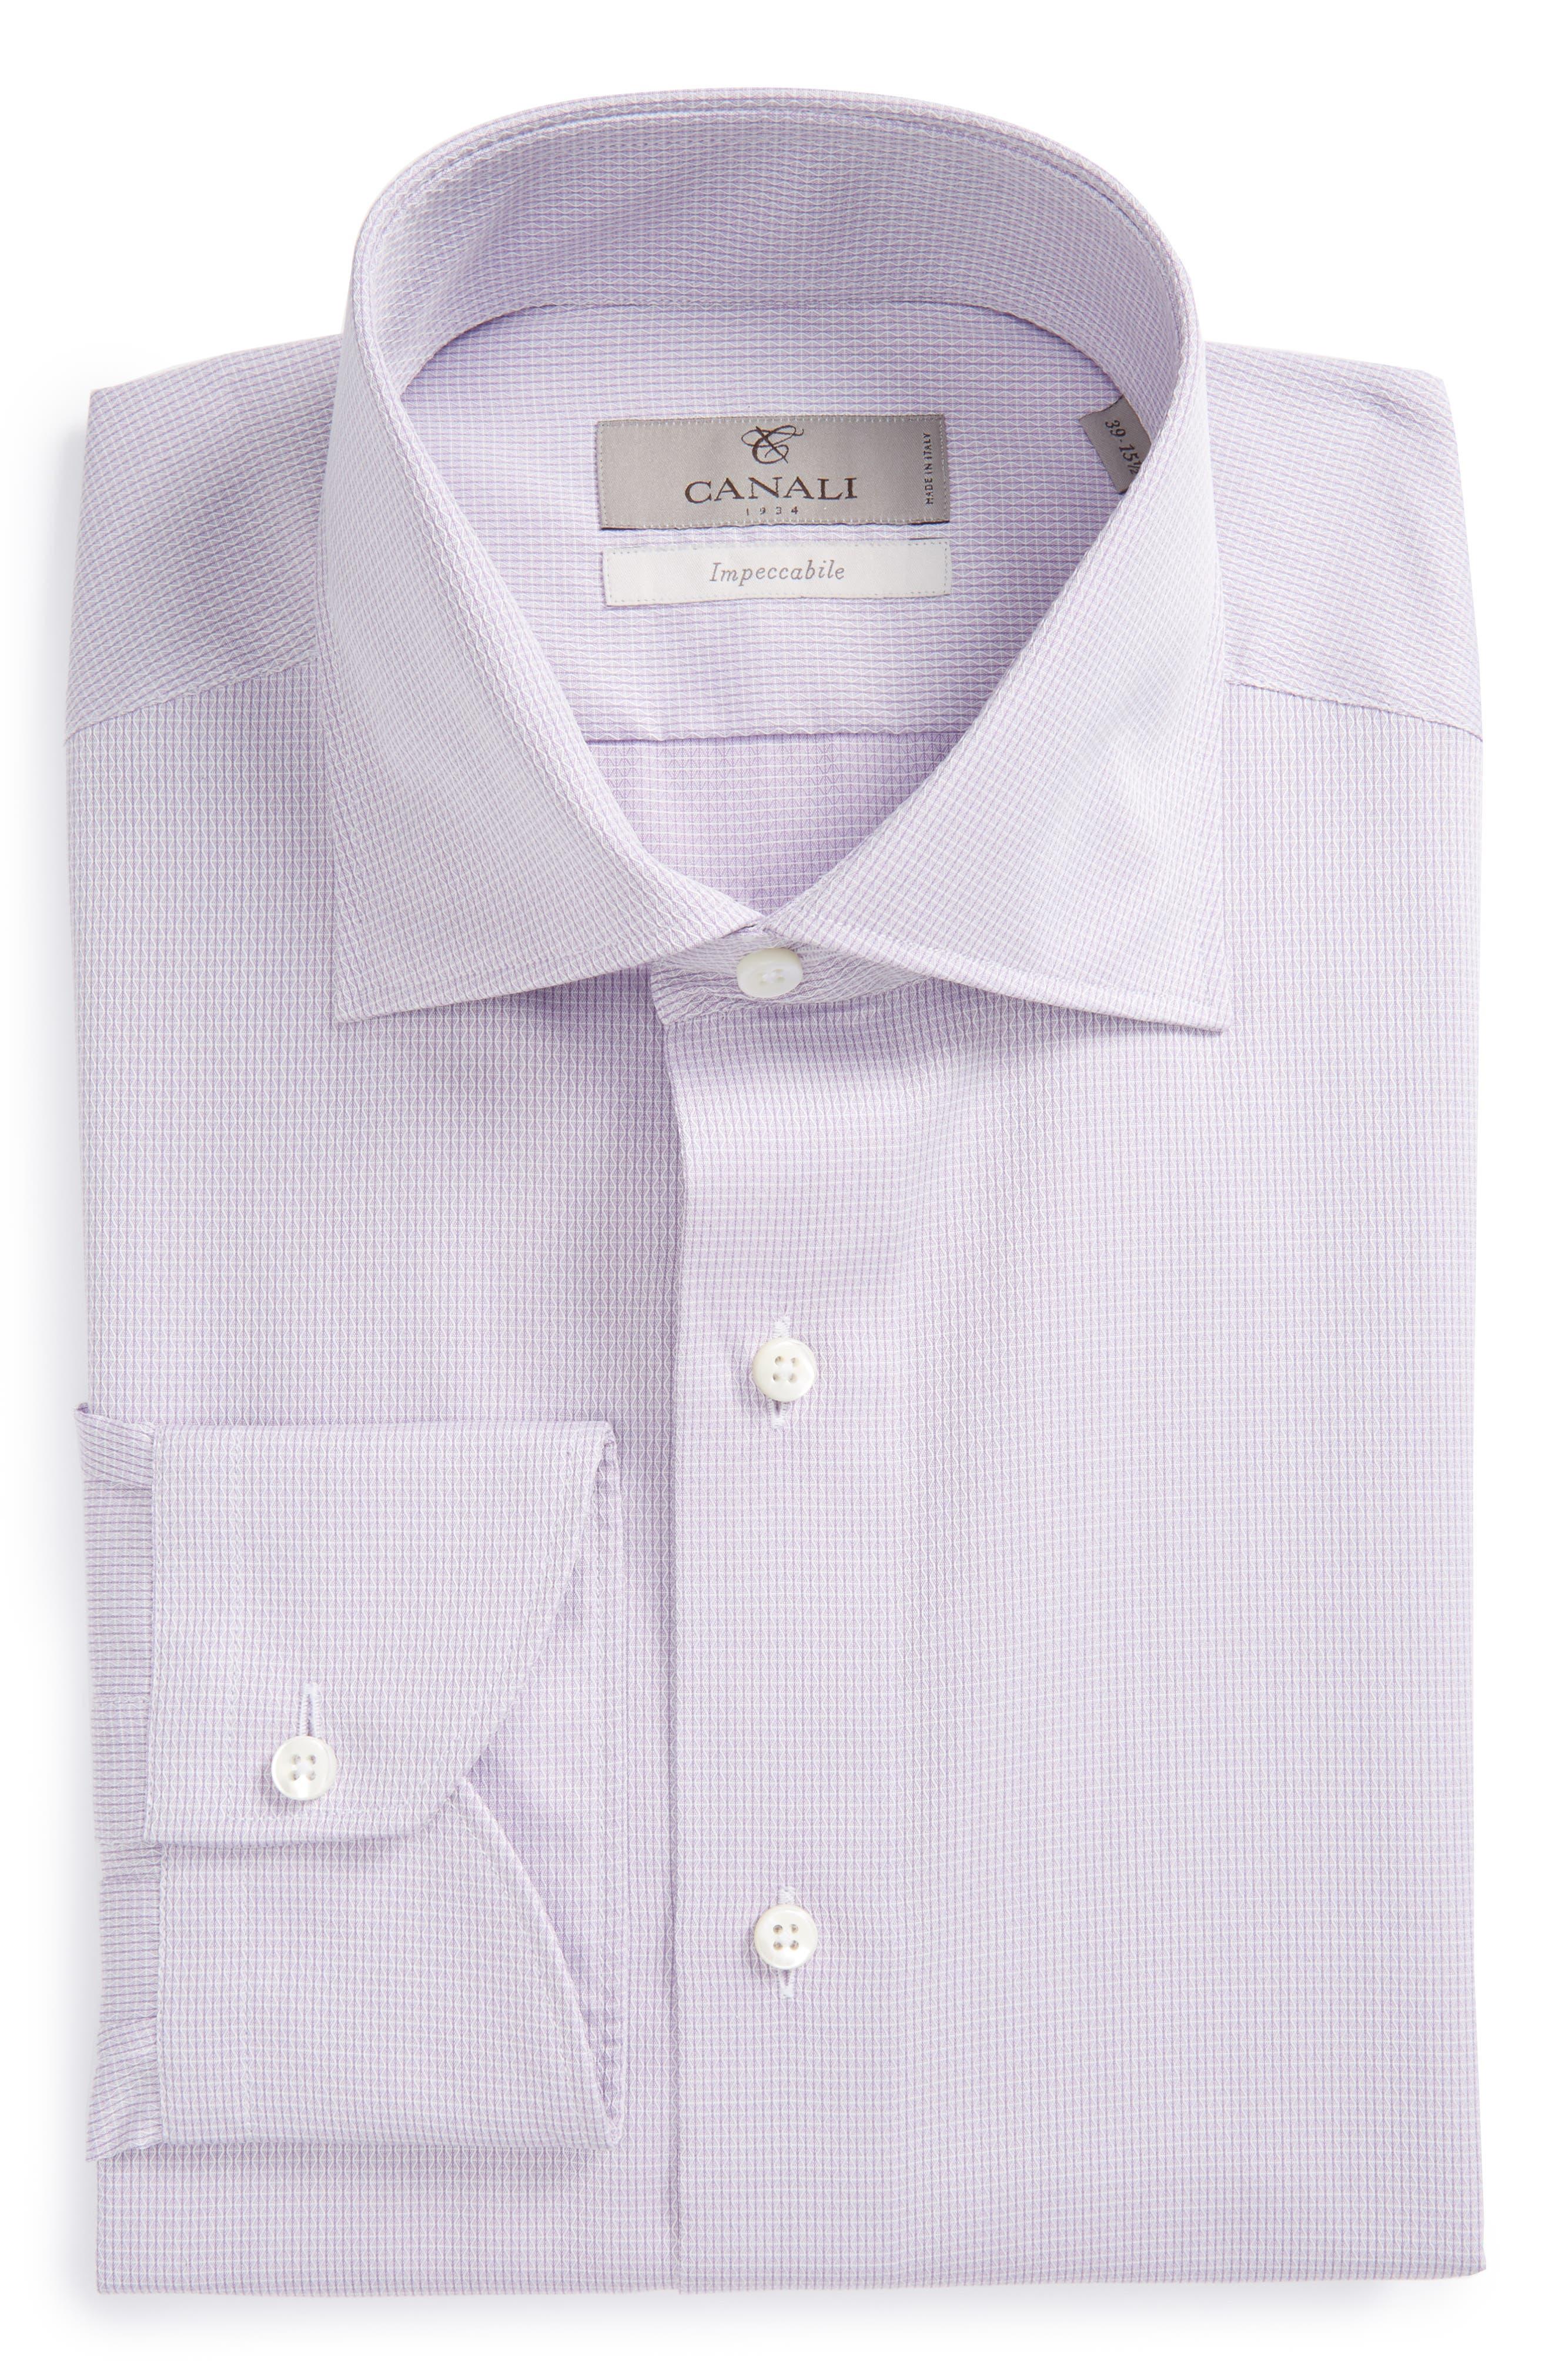 Regular Fit Geometric Dress Shirt,                         Main,                         color, 510